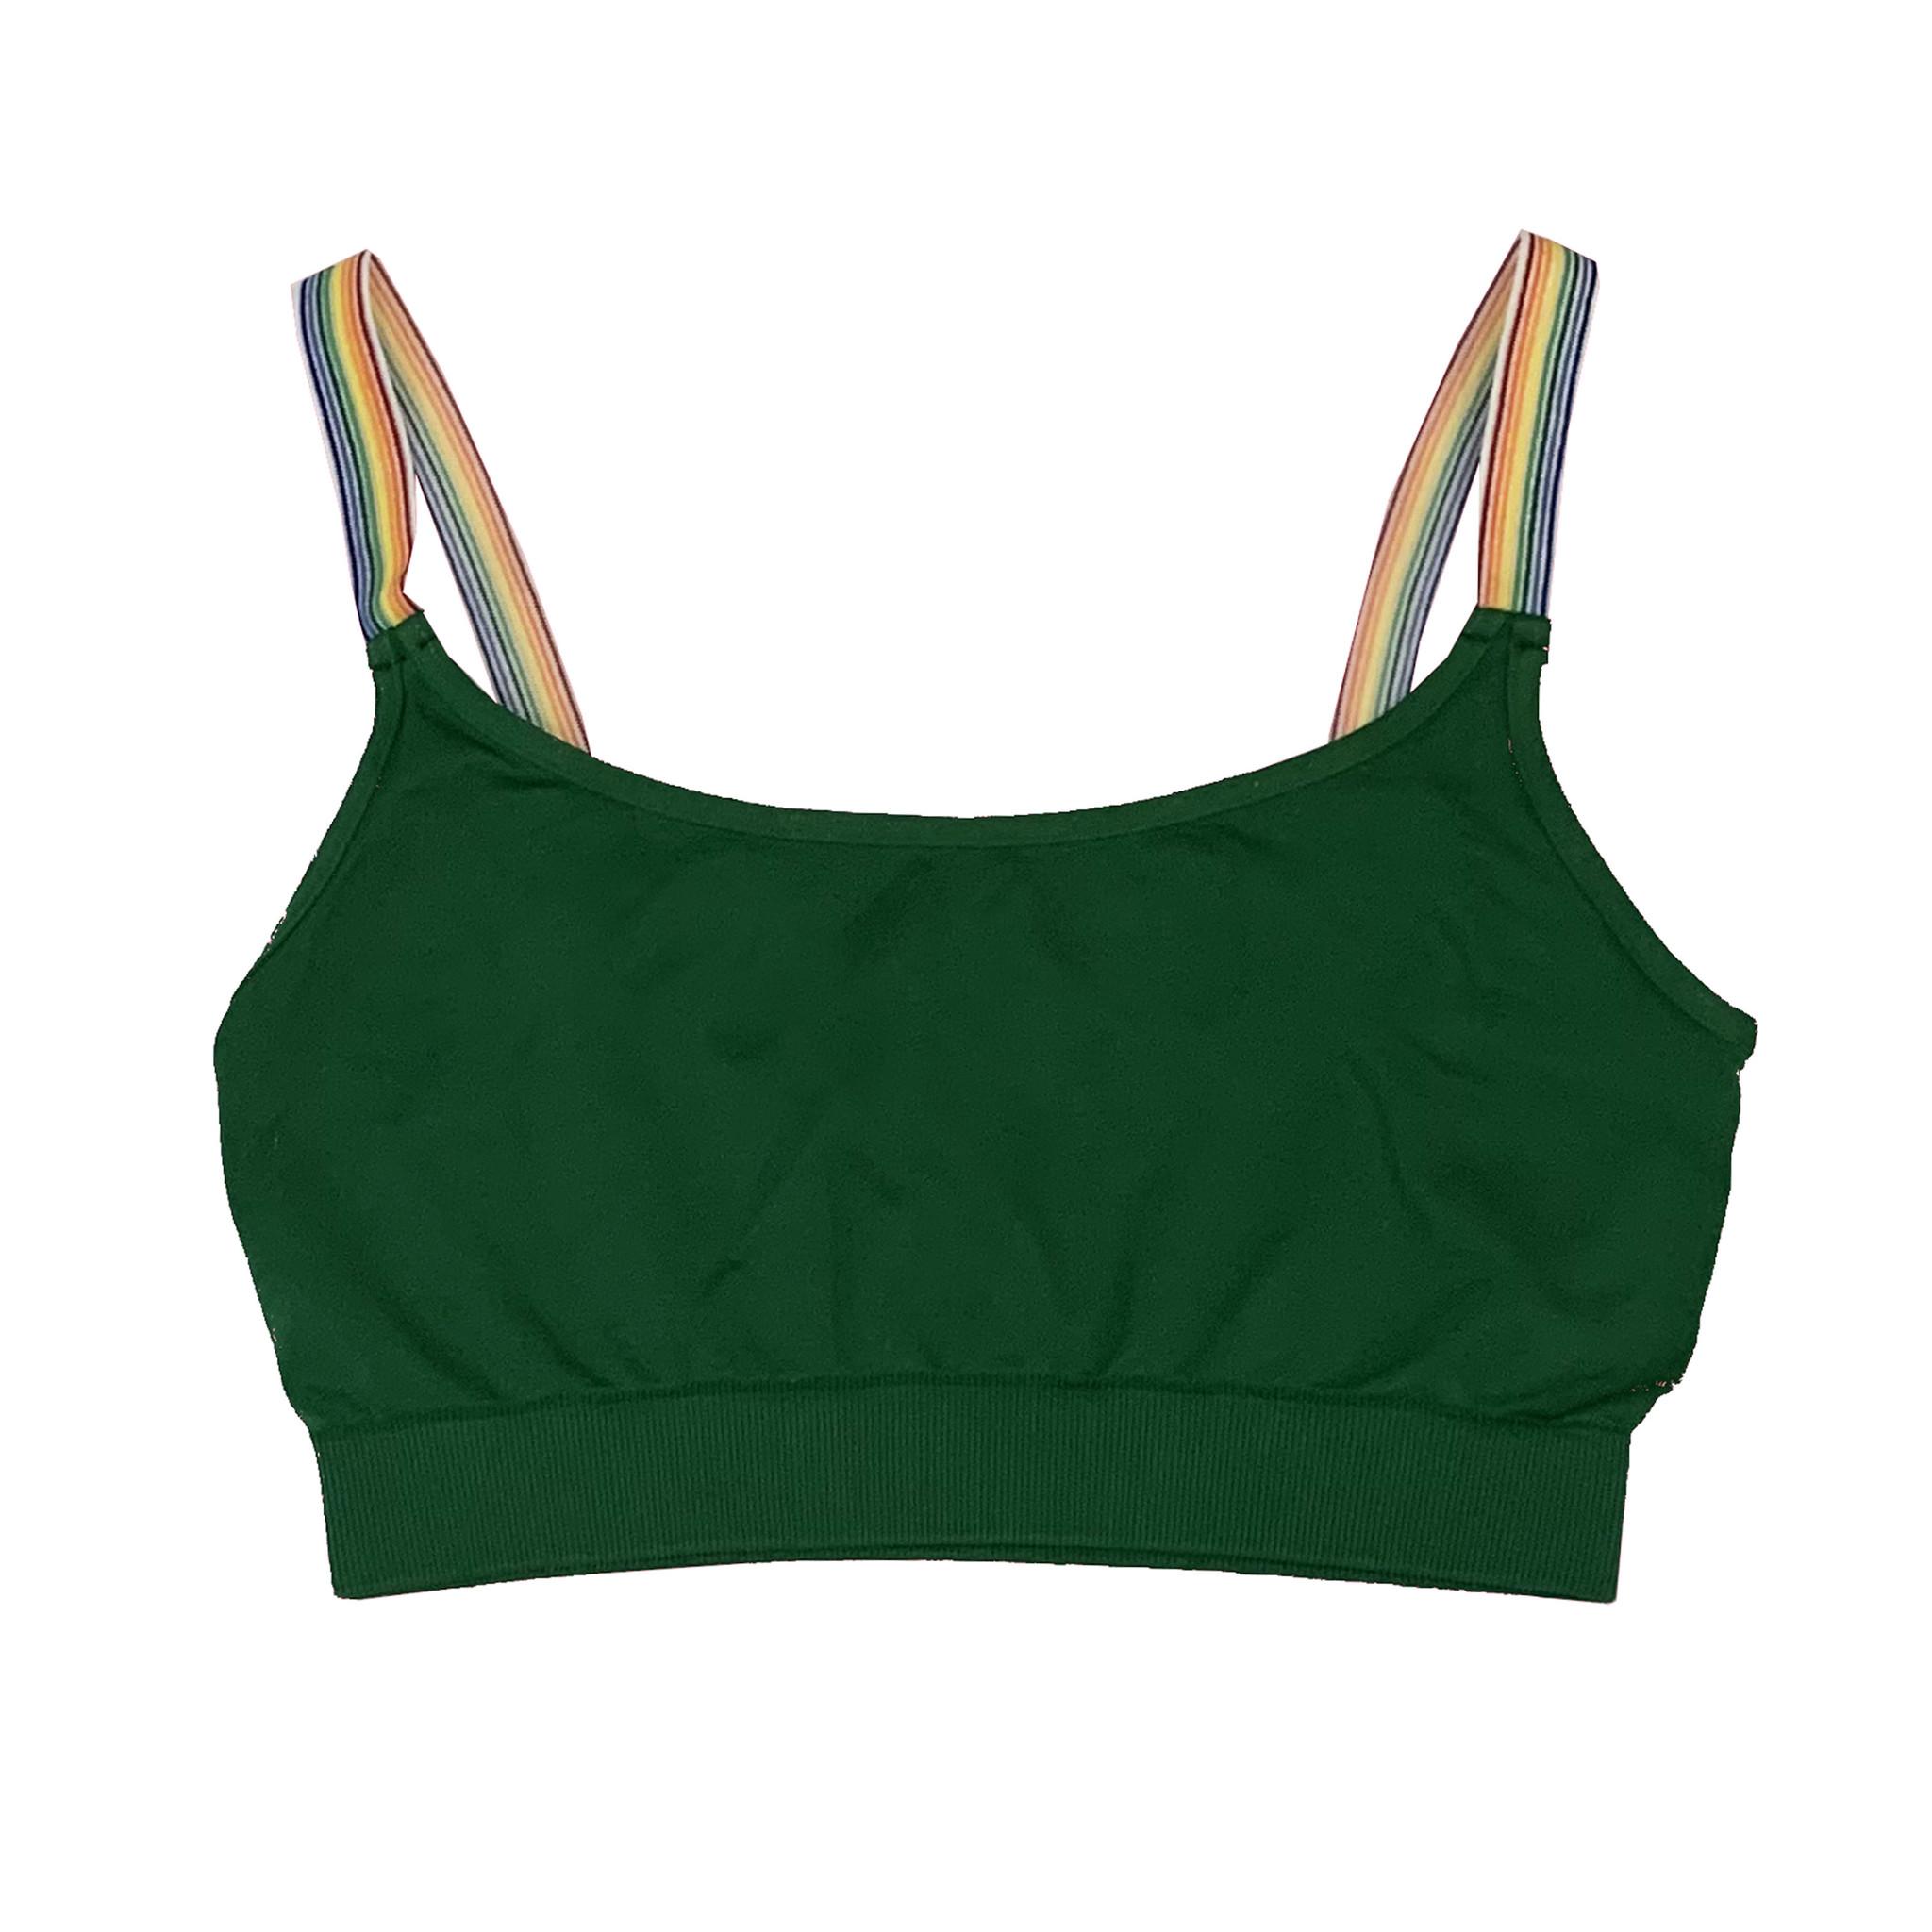 Malibu Sugar Green Rainbow Strap Bralette 7-10